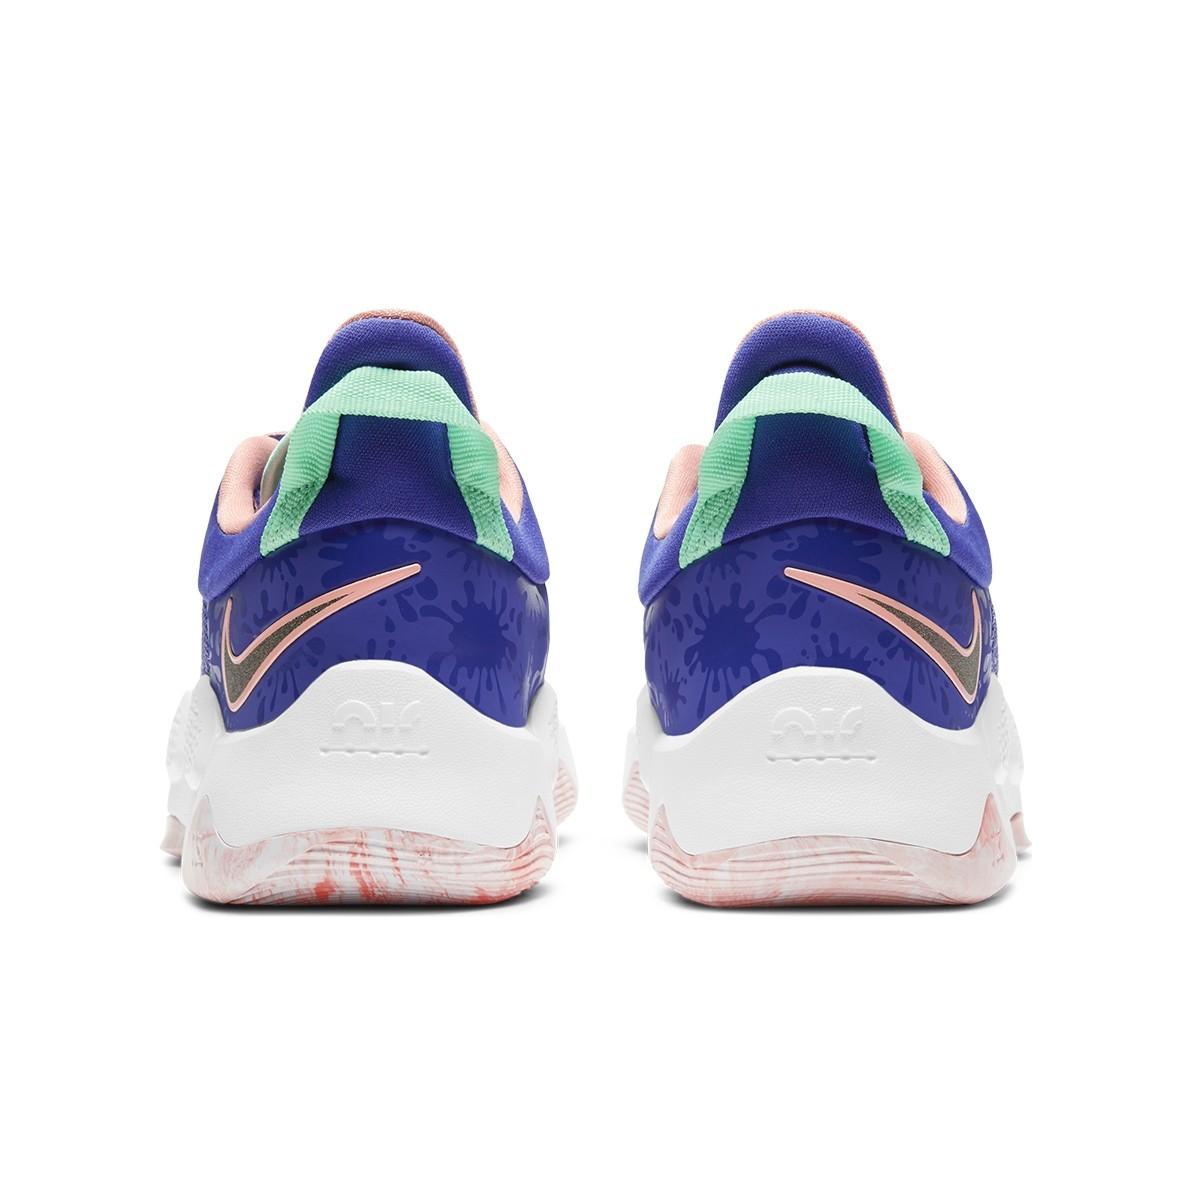 Nike PG 5 'LA Drip'-CW3143-400